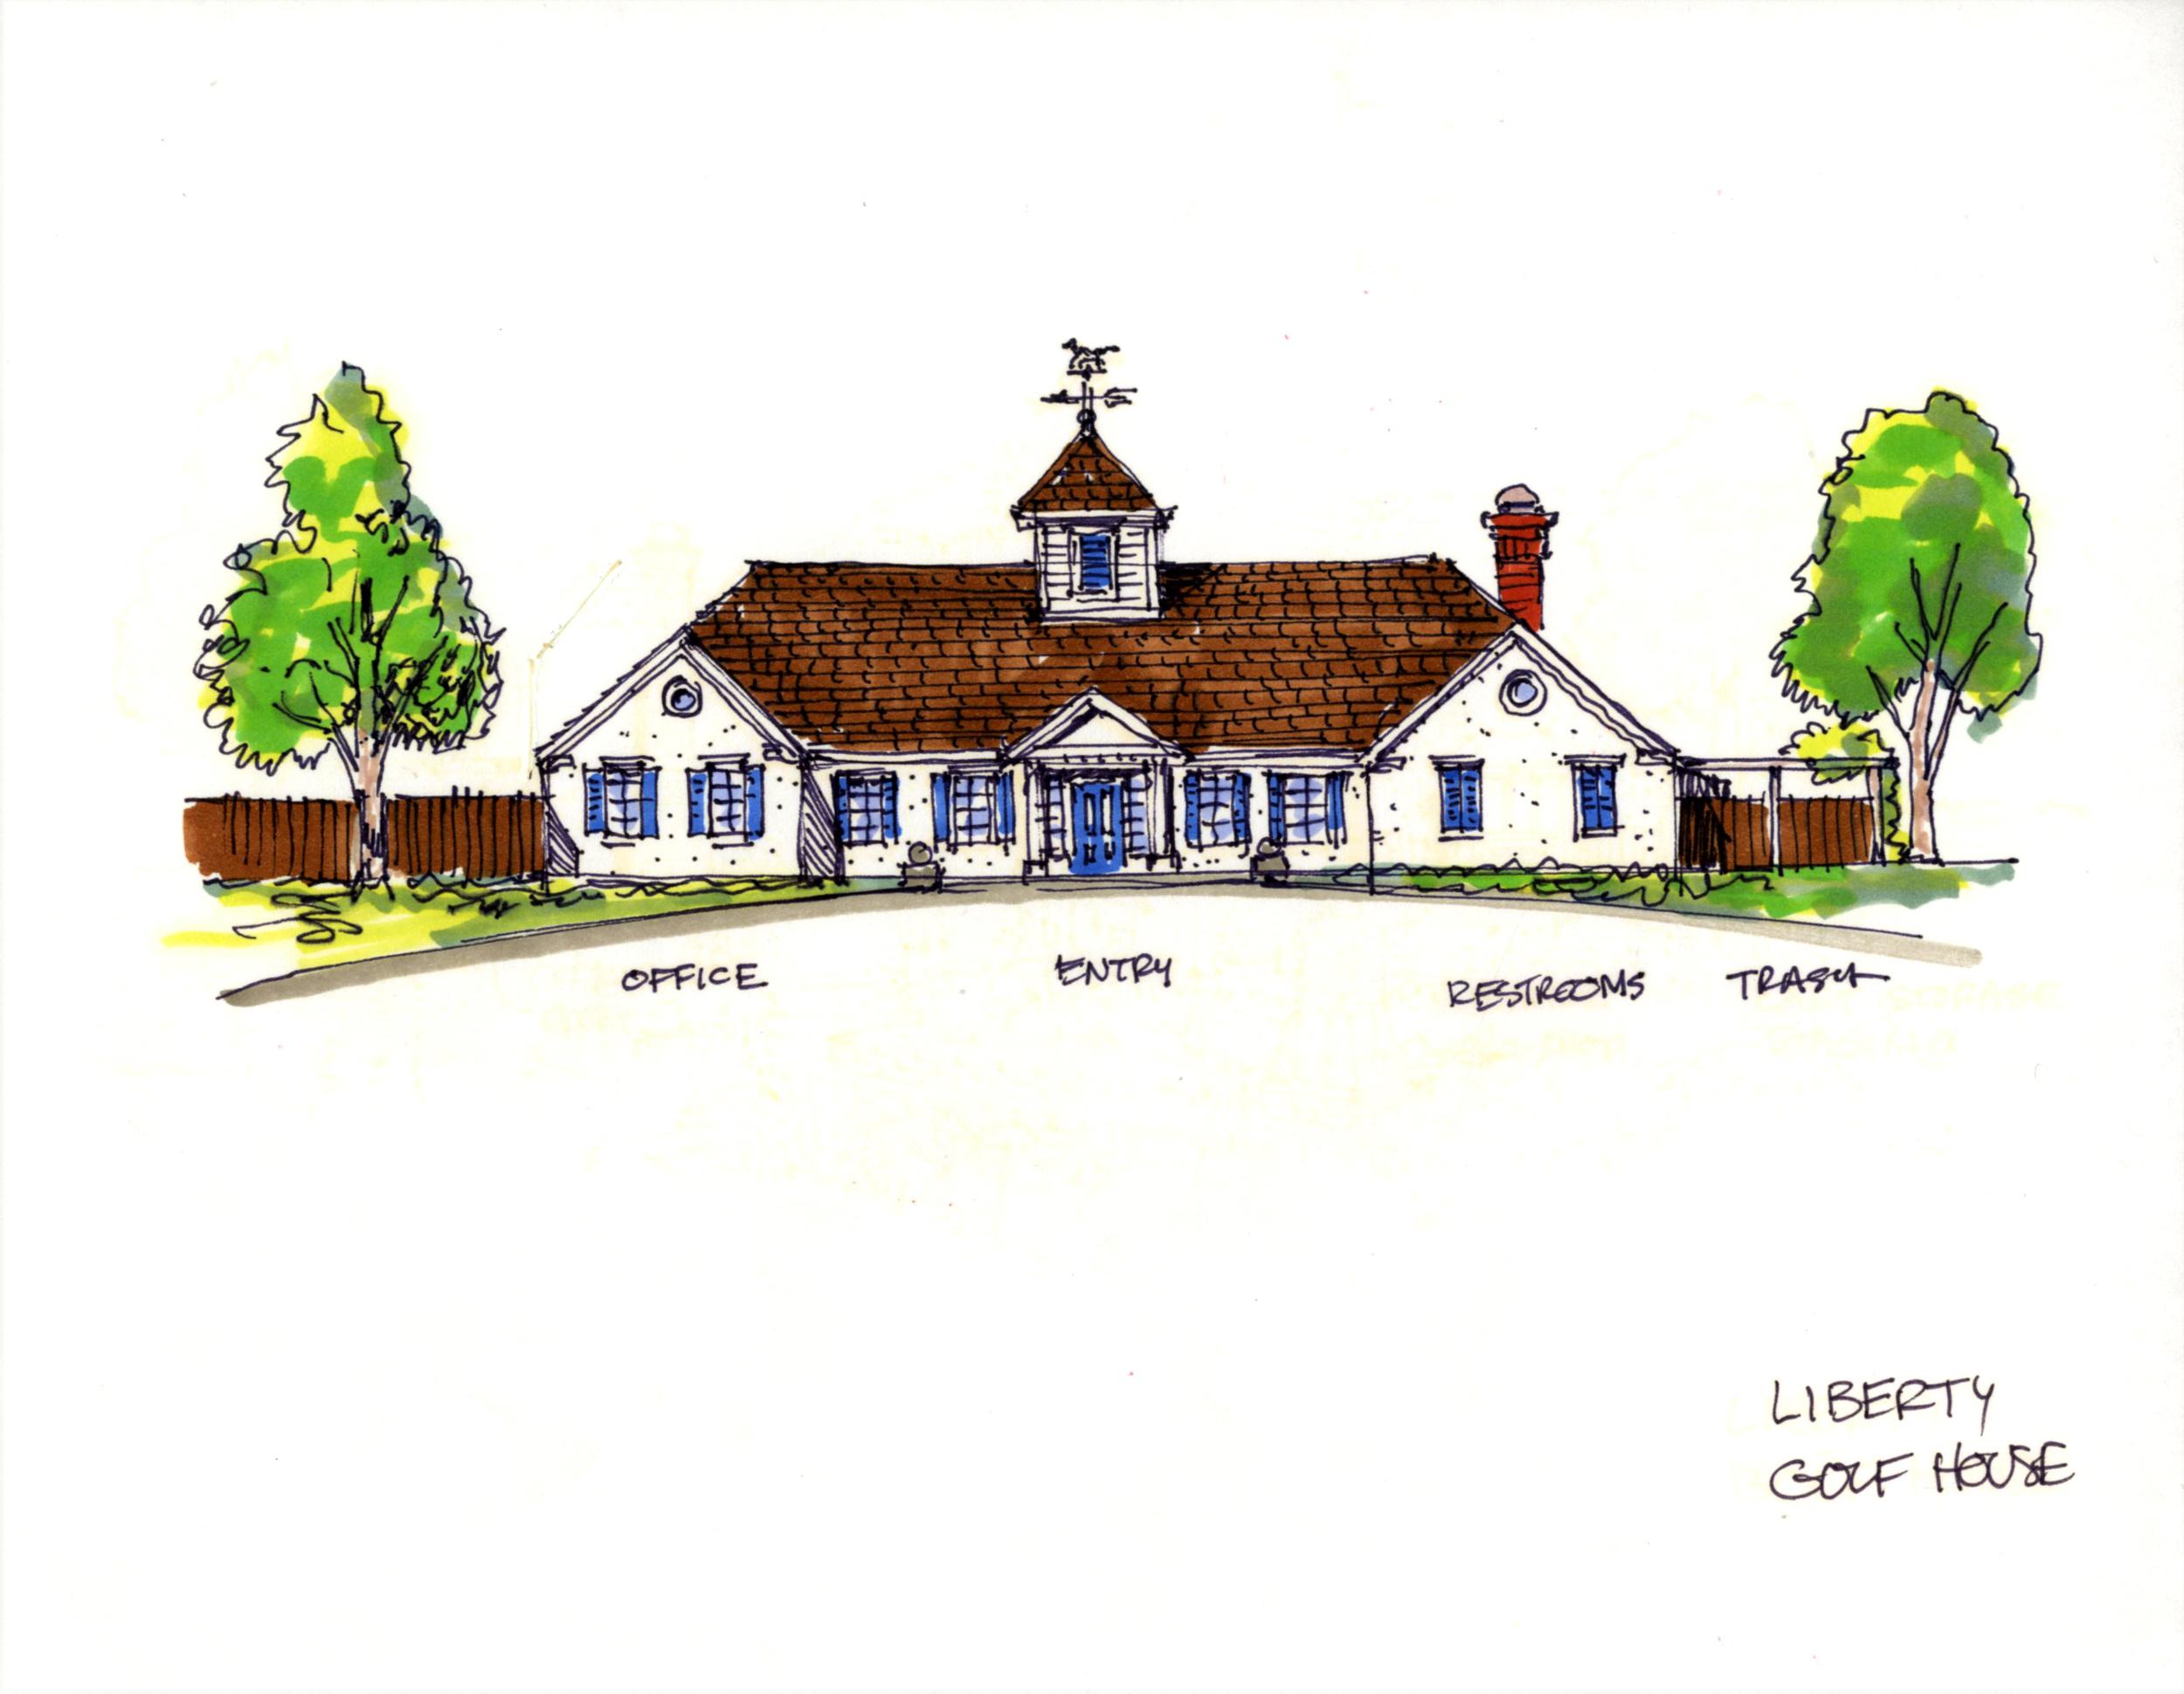 Liberty Golf Club211.jpg